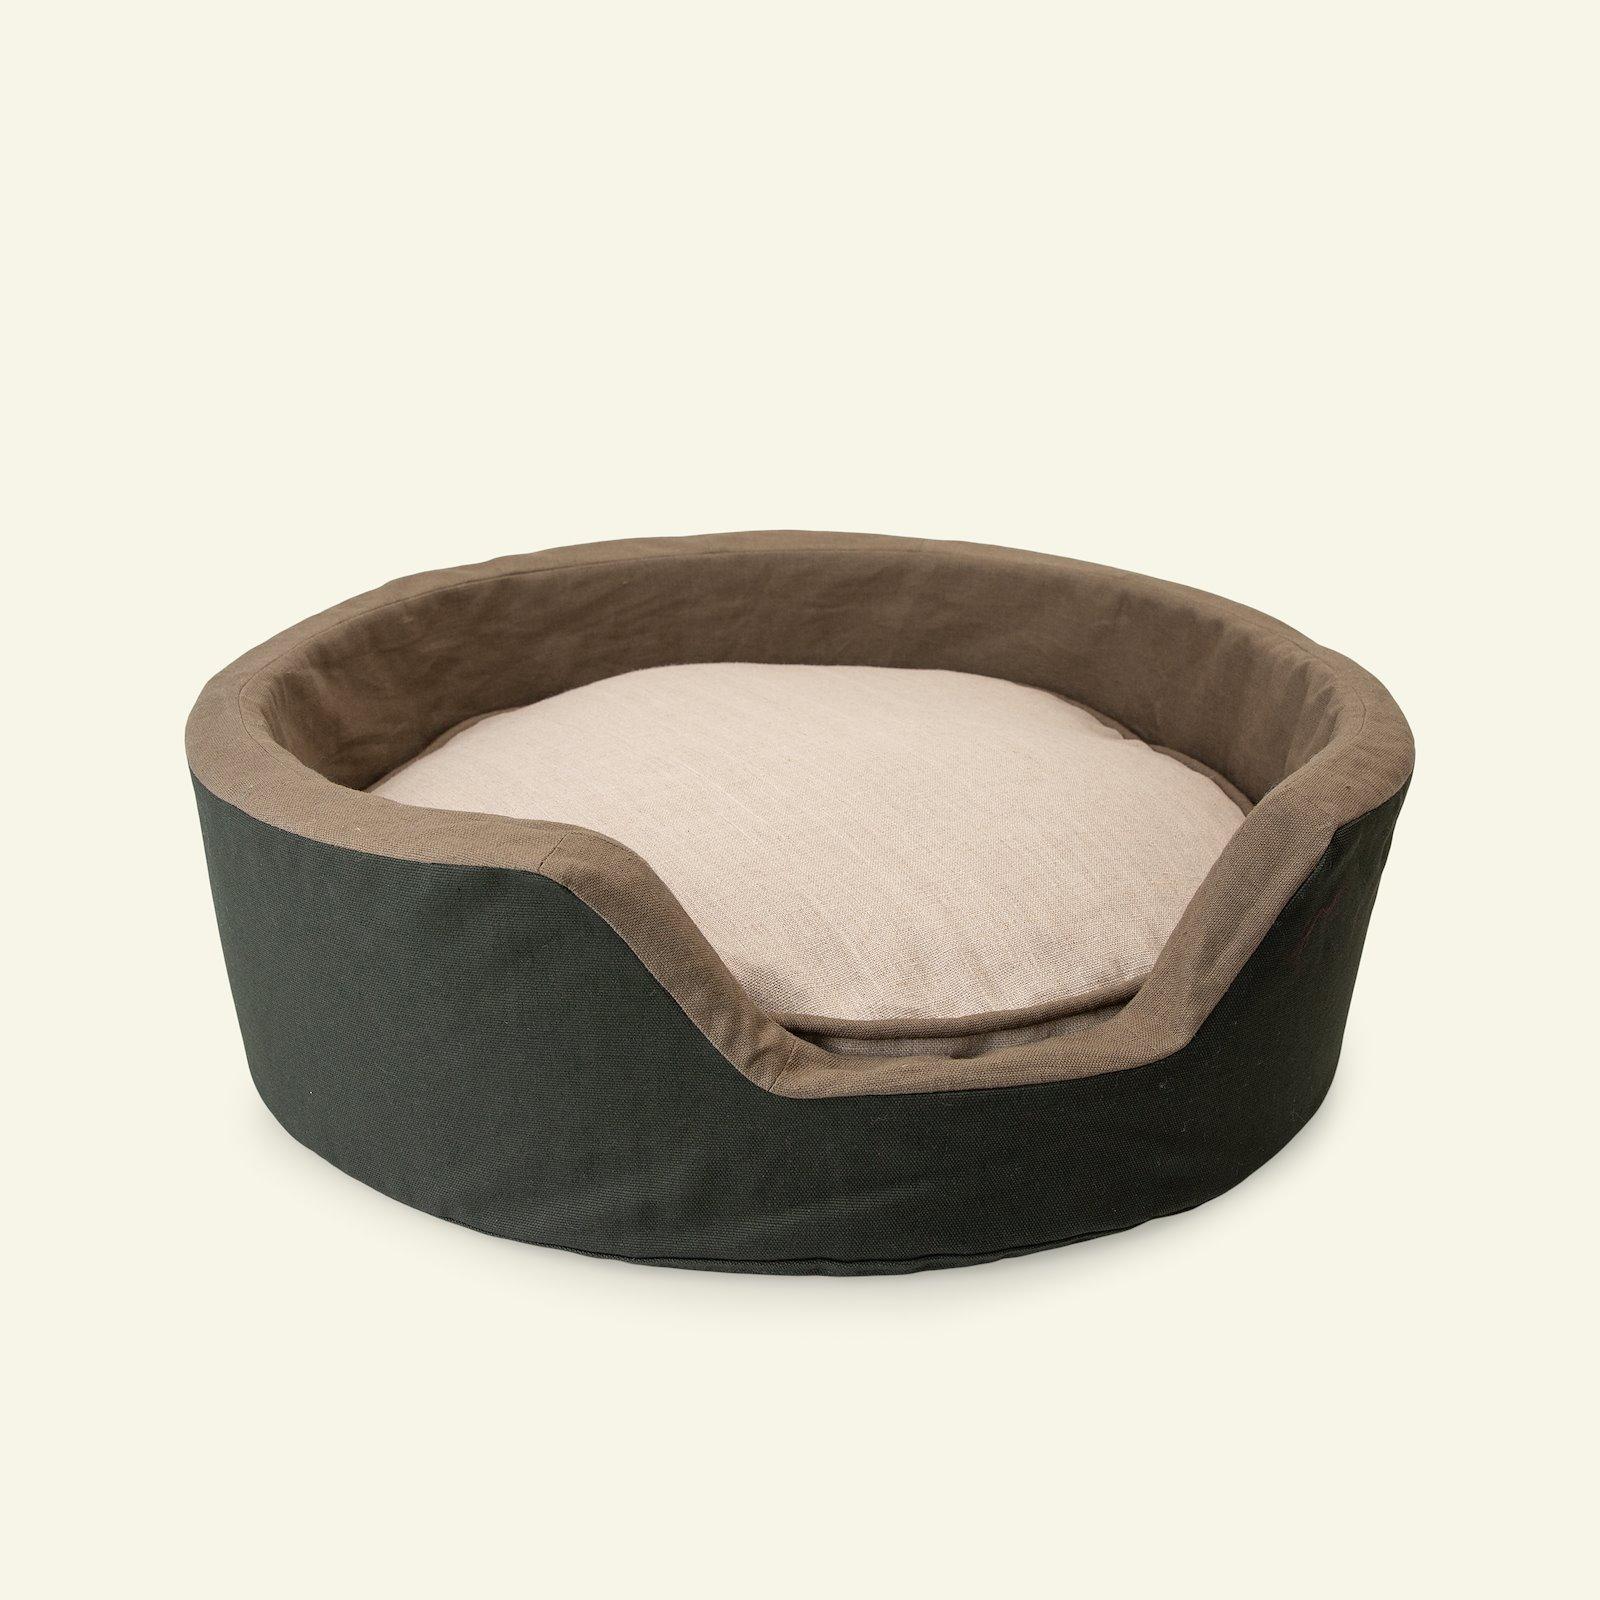 Dog basket p90348_780403_800205_510961_sskit